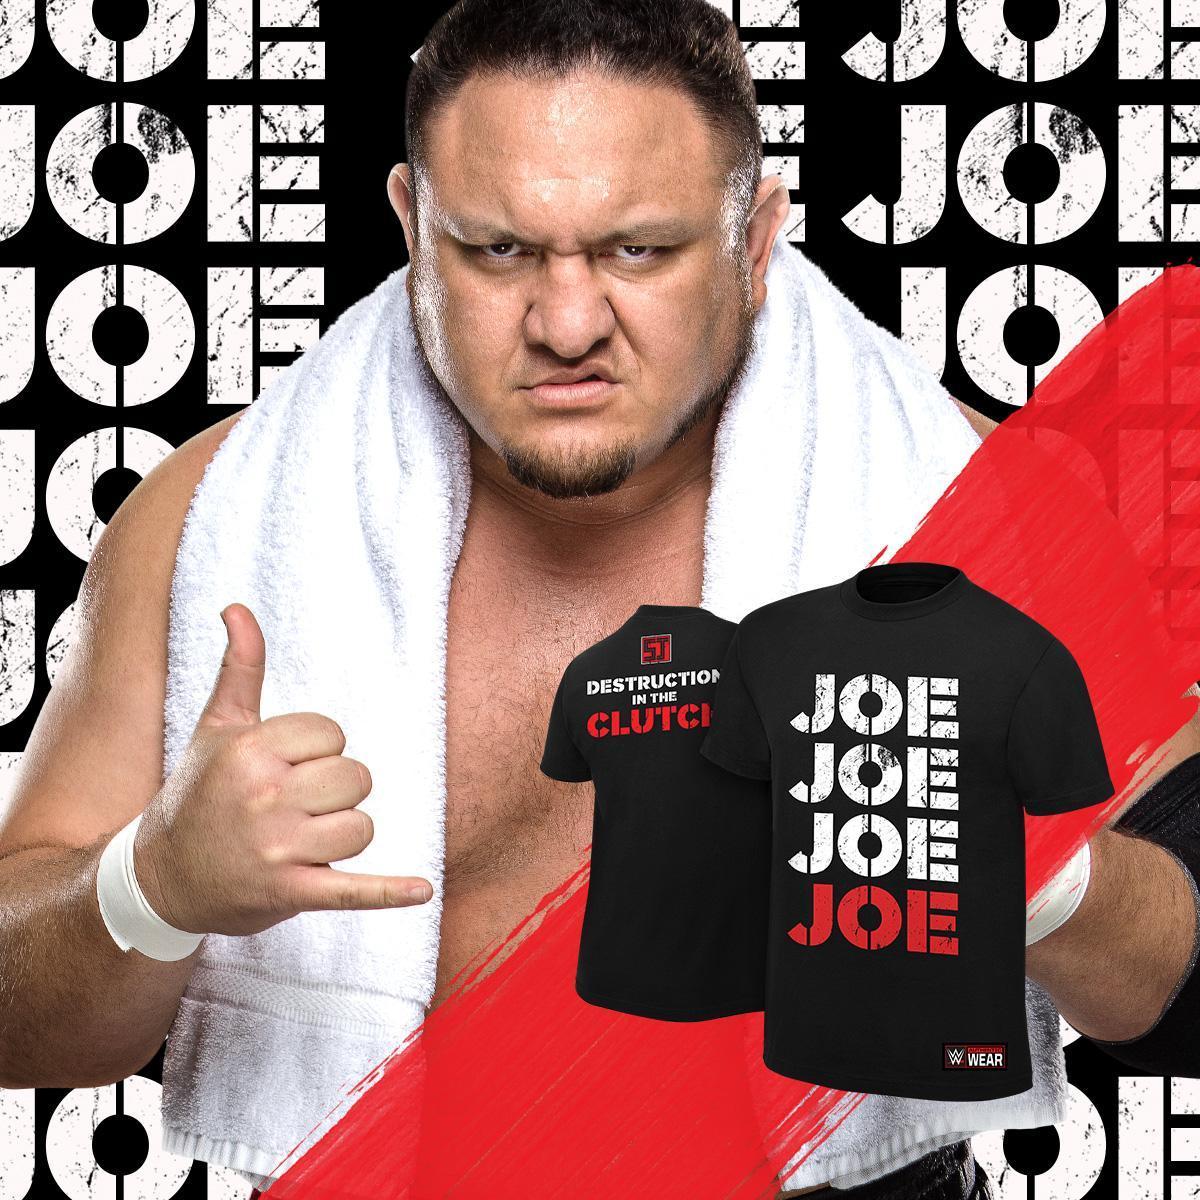 Joe! All-new #SamoaJoe tee now available at #WWEShop. #WWE bit.ly/2jKXcaf